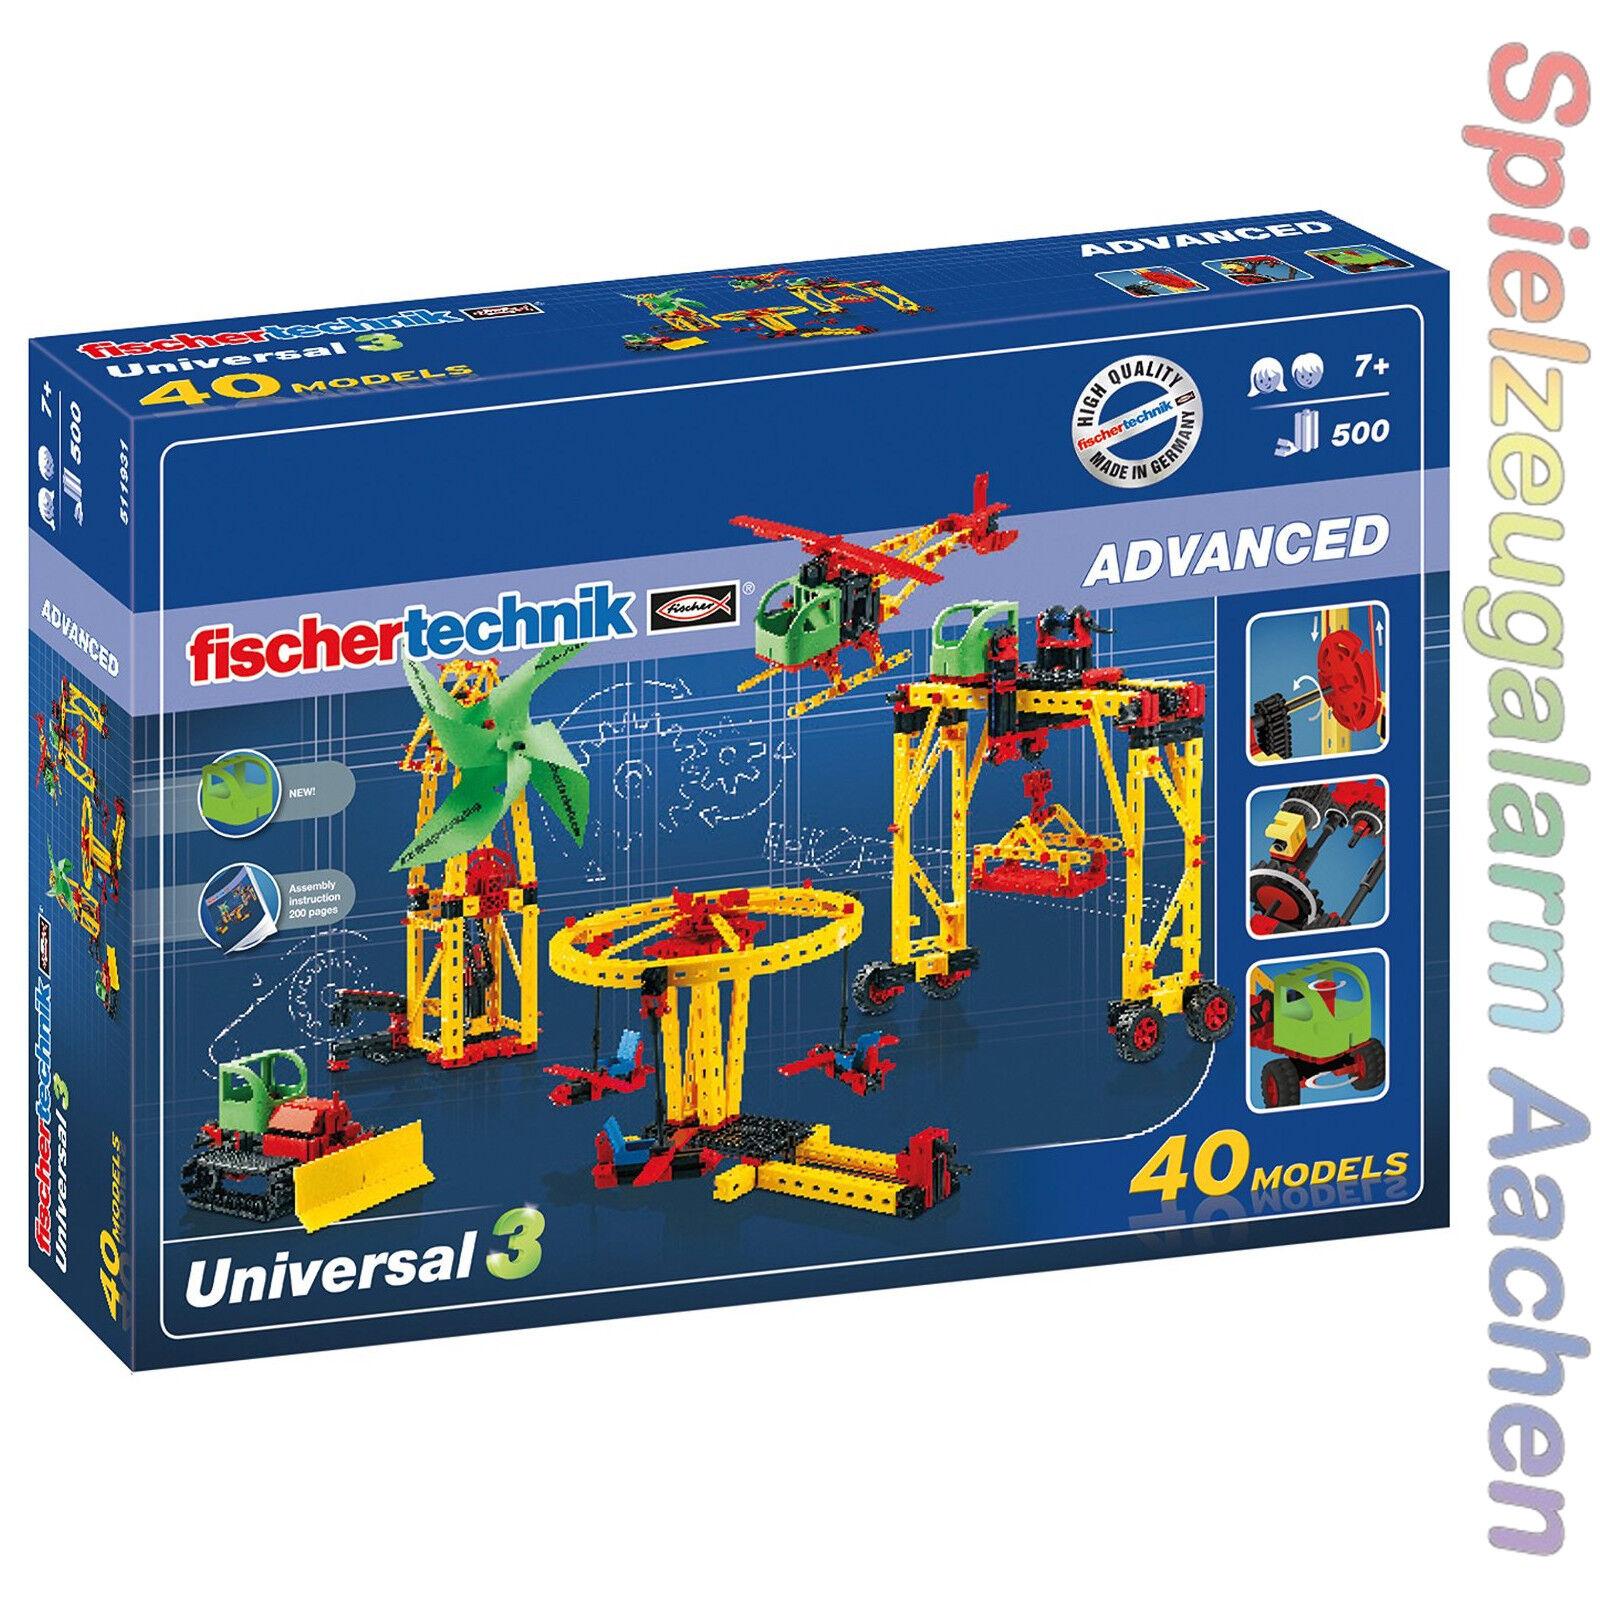 Fischertechnik ADVANCED 511931 Universal 3 Konstruktionsbaukasten 40 Modelle OVP